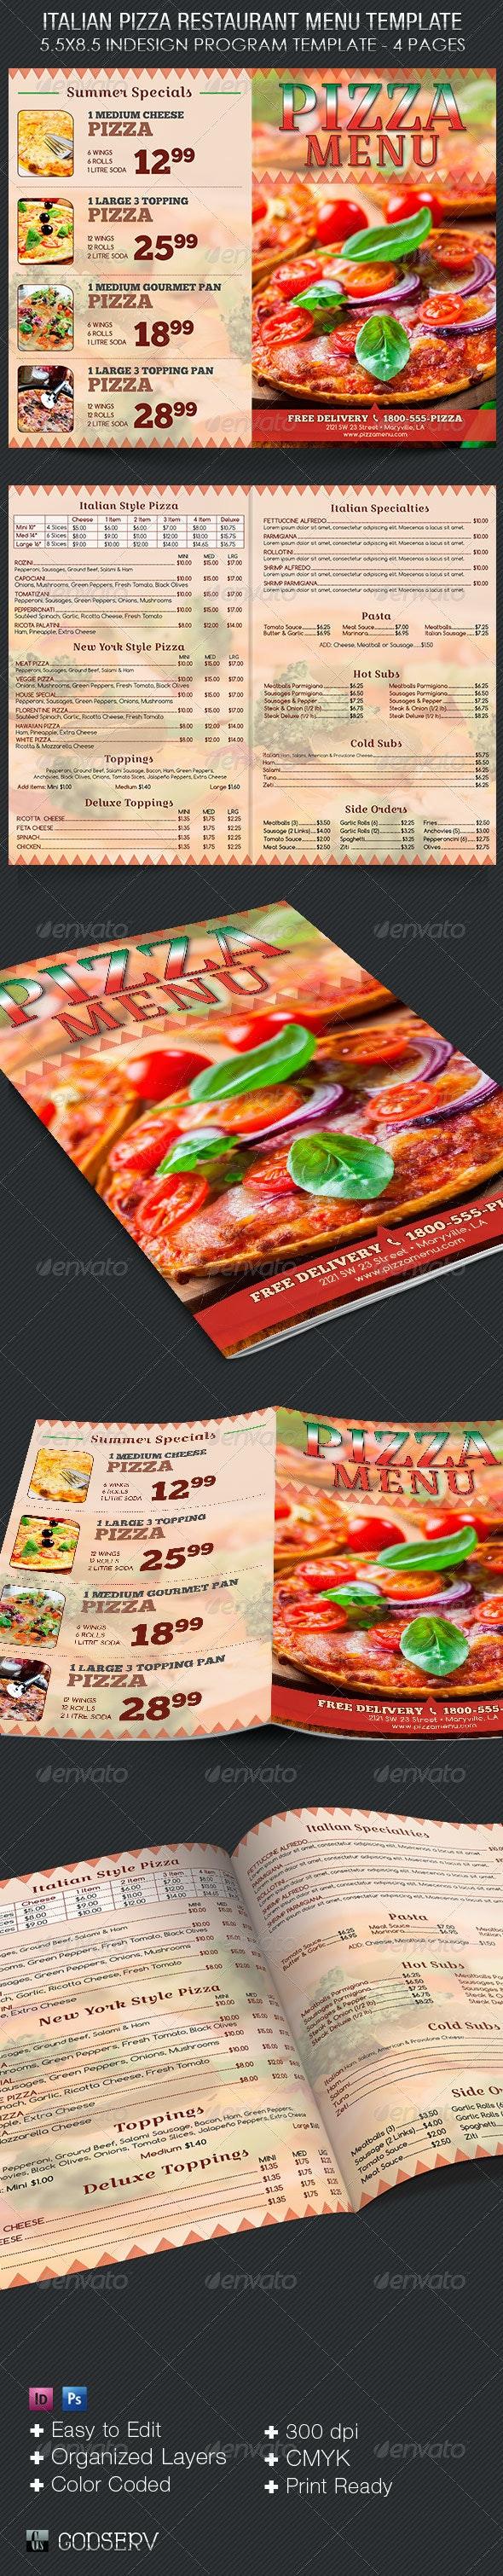 Italian Pizza Restaurant Menu Template - Food Menus Print Templates